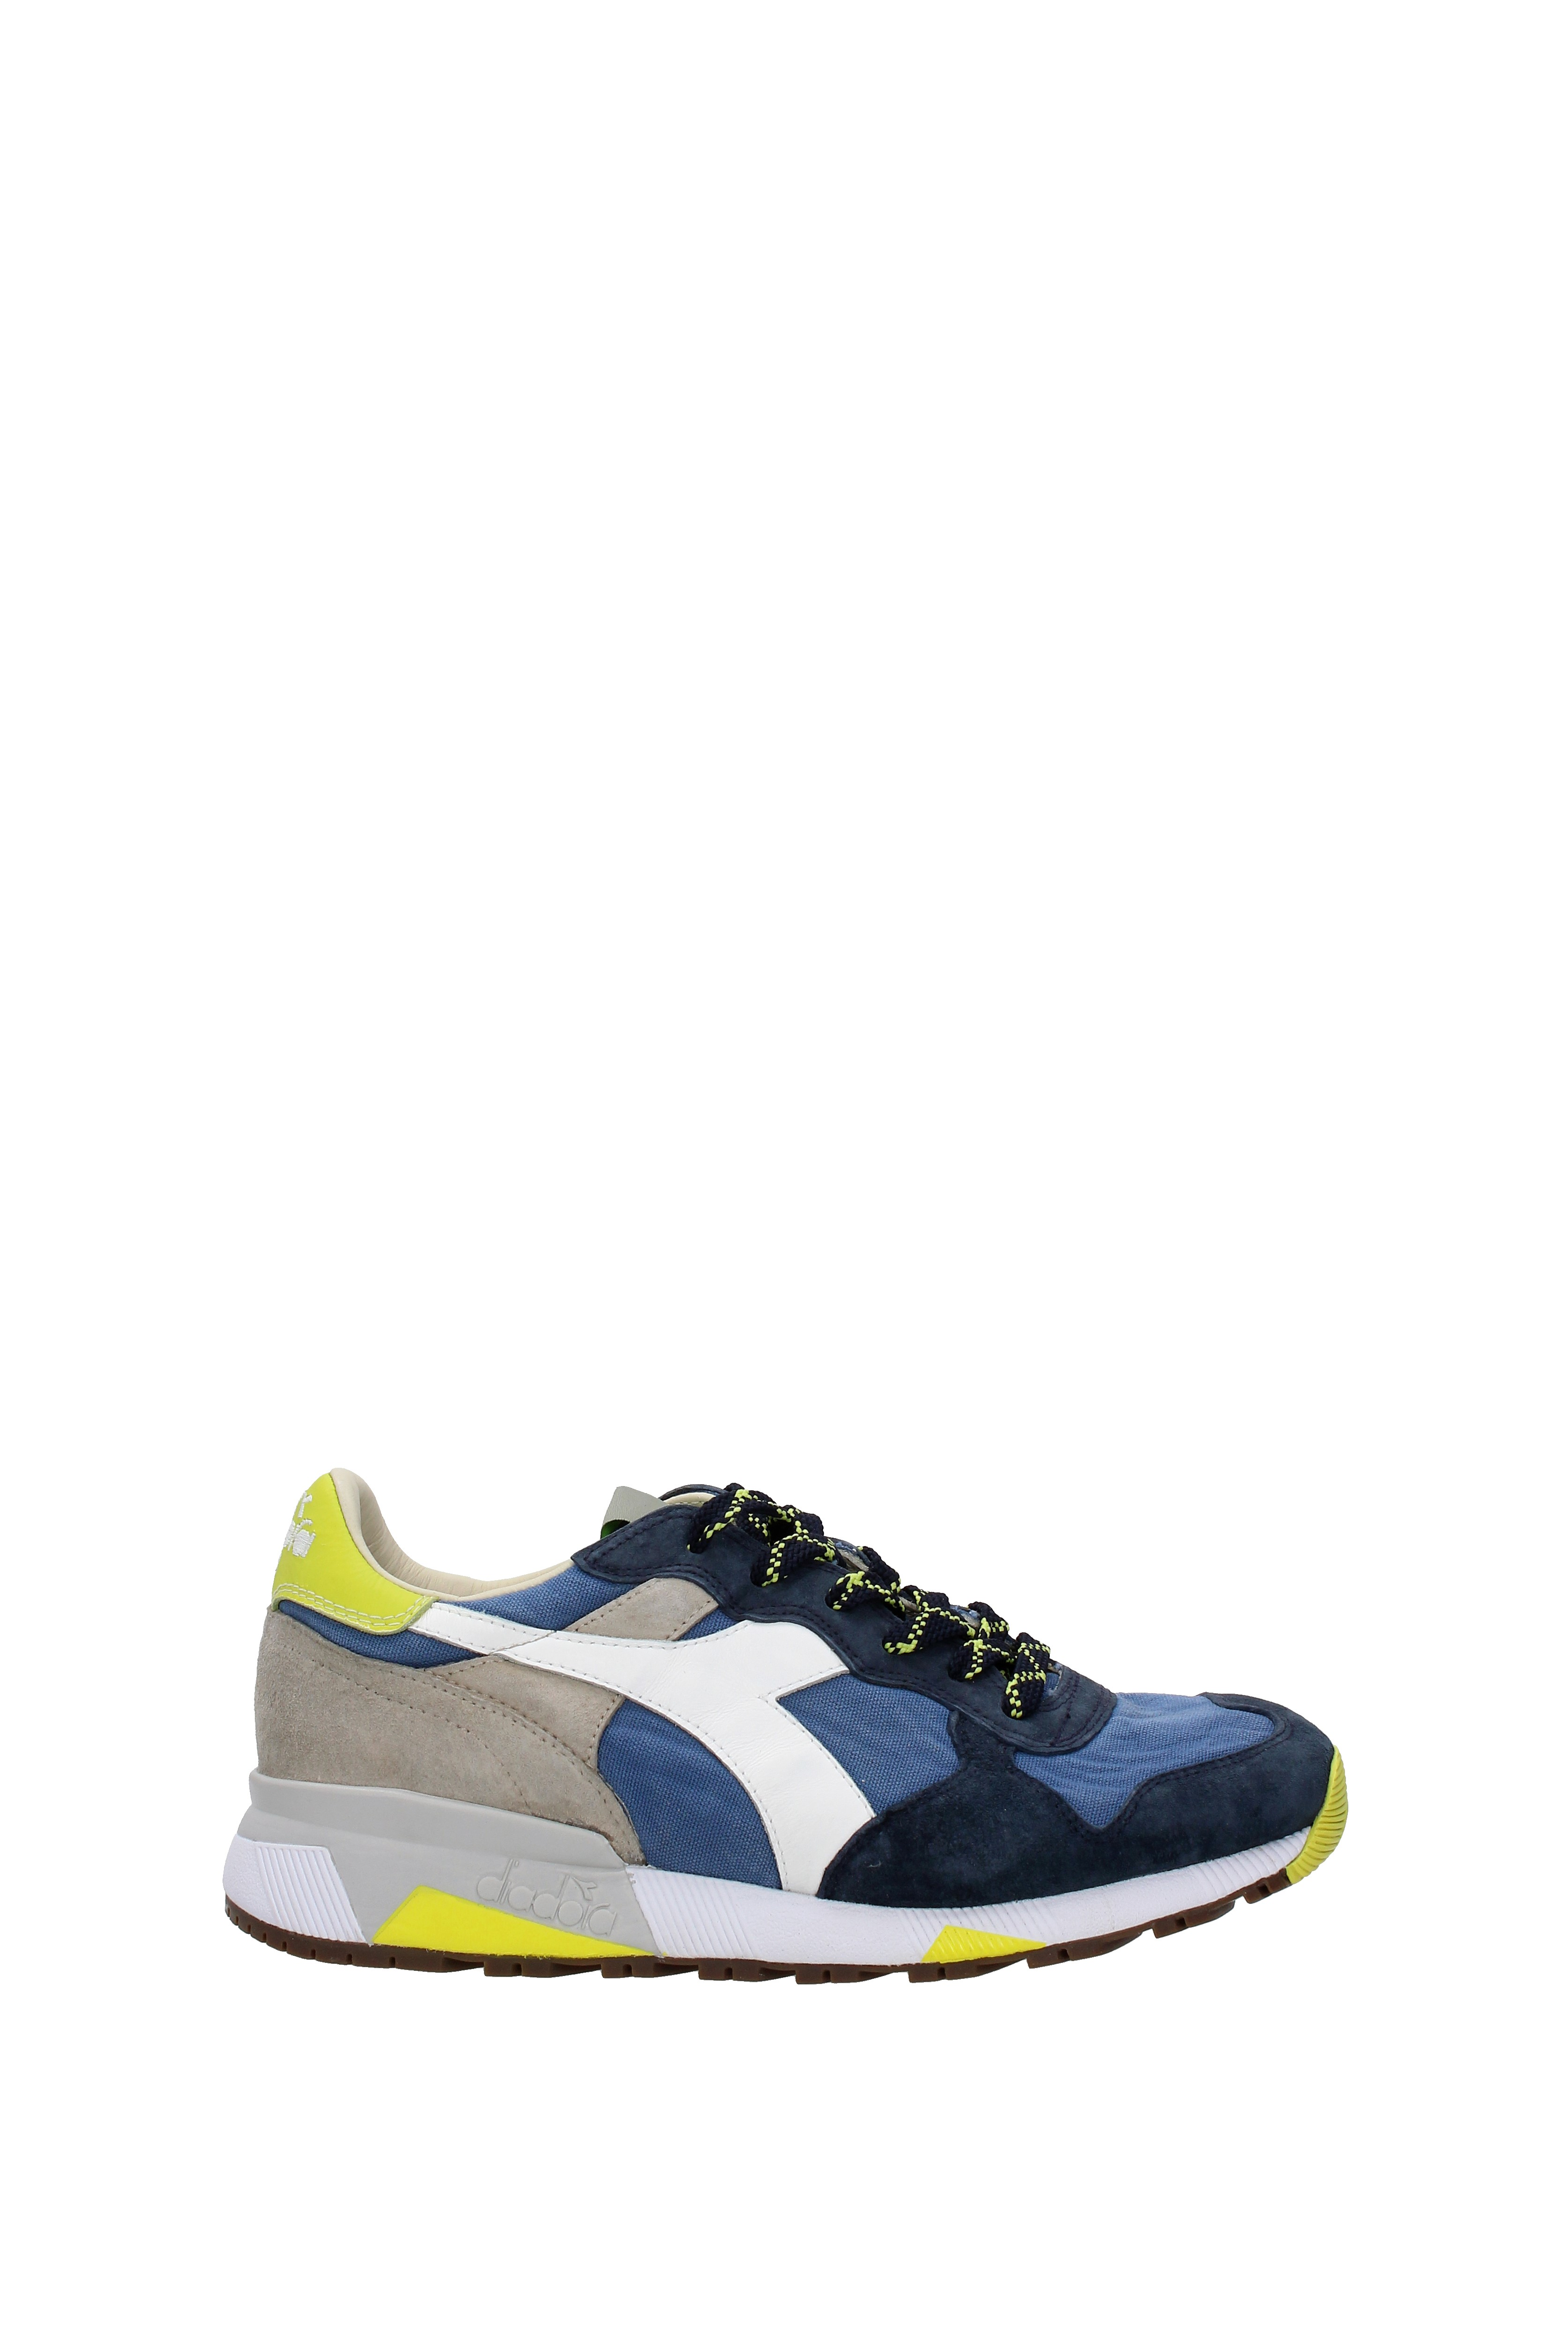 Sneakers Diadora Heritage Uomo Tessuto 20116130401